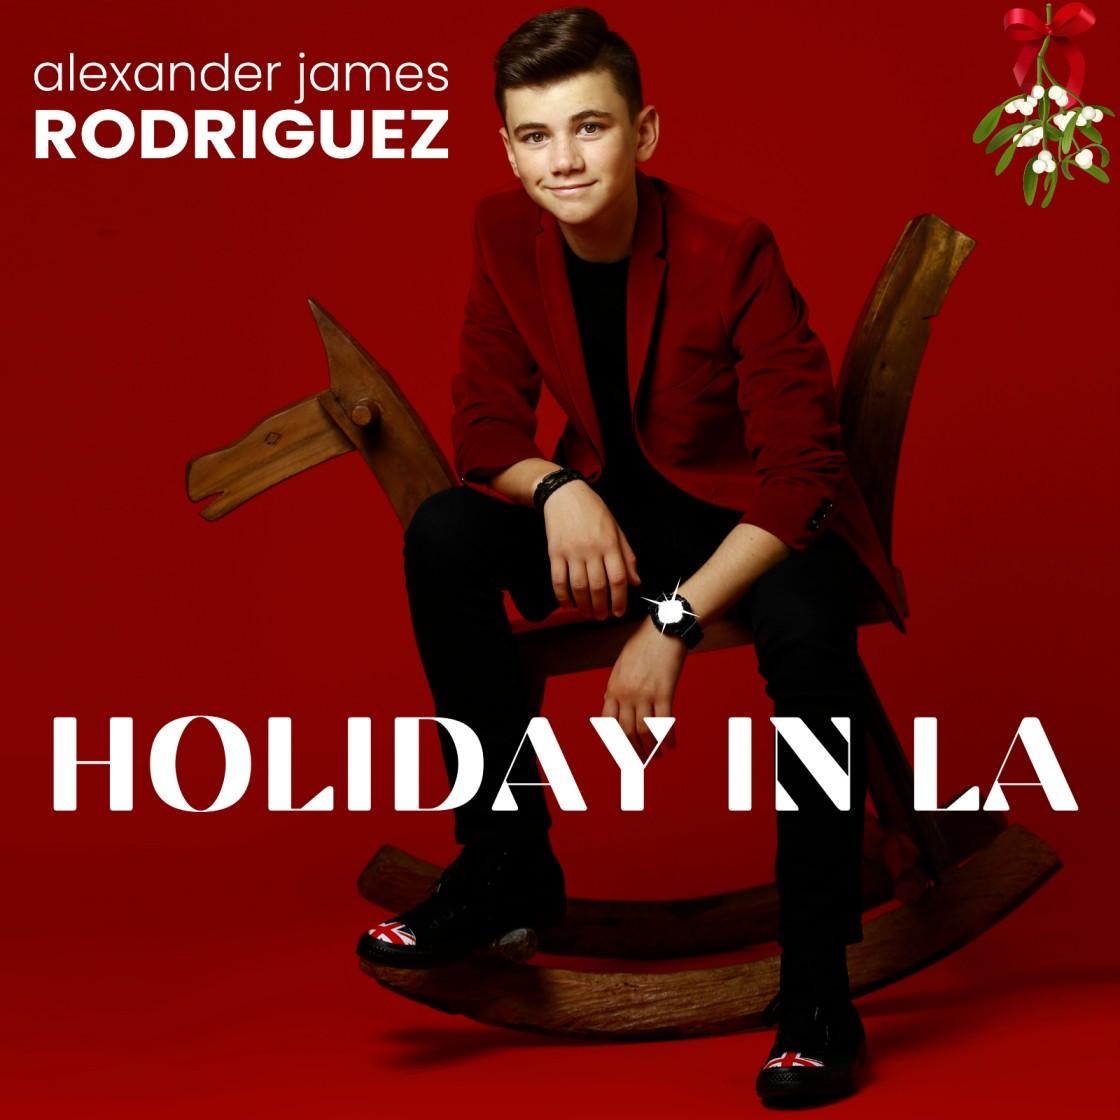 Holiday in LA - Alexander James Rodriguez